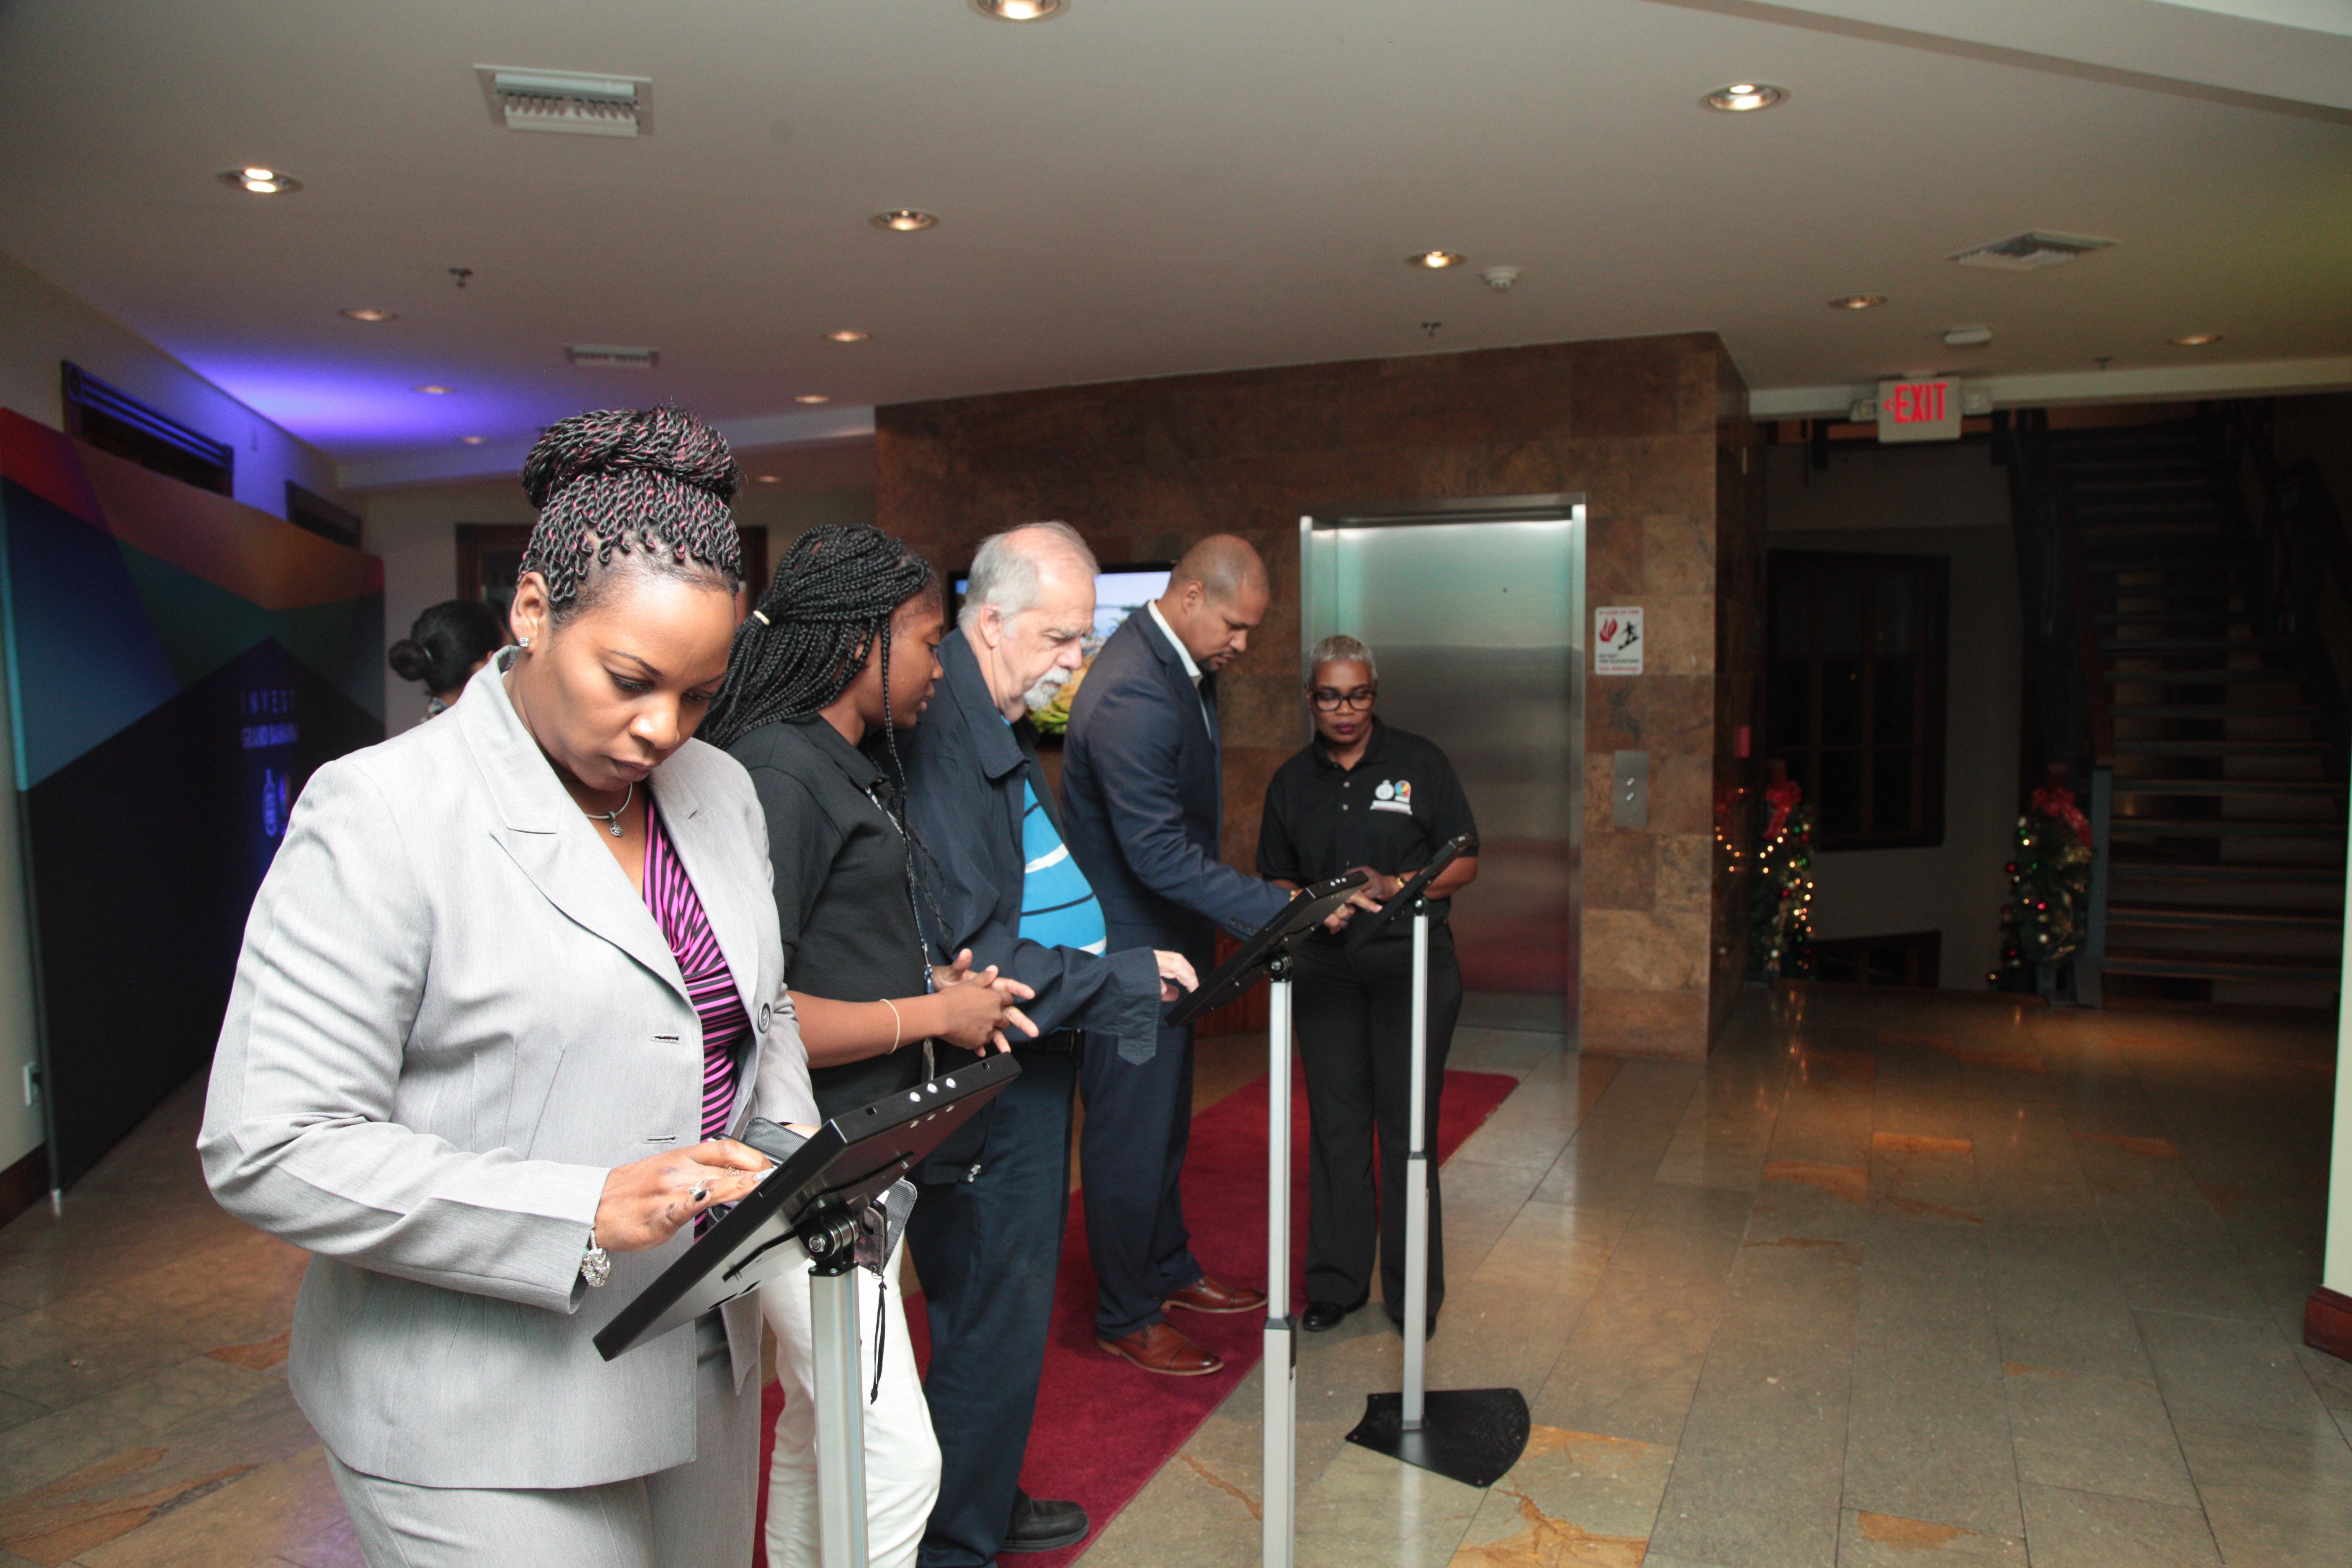 New My Grand Bahama app highlights customer service experiences